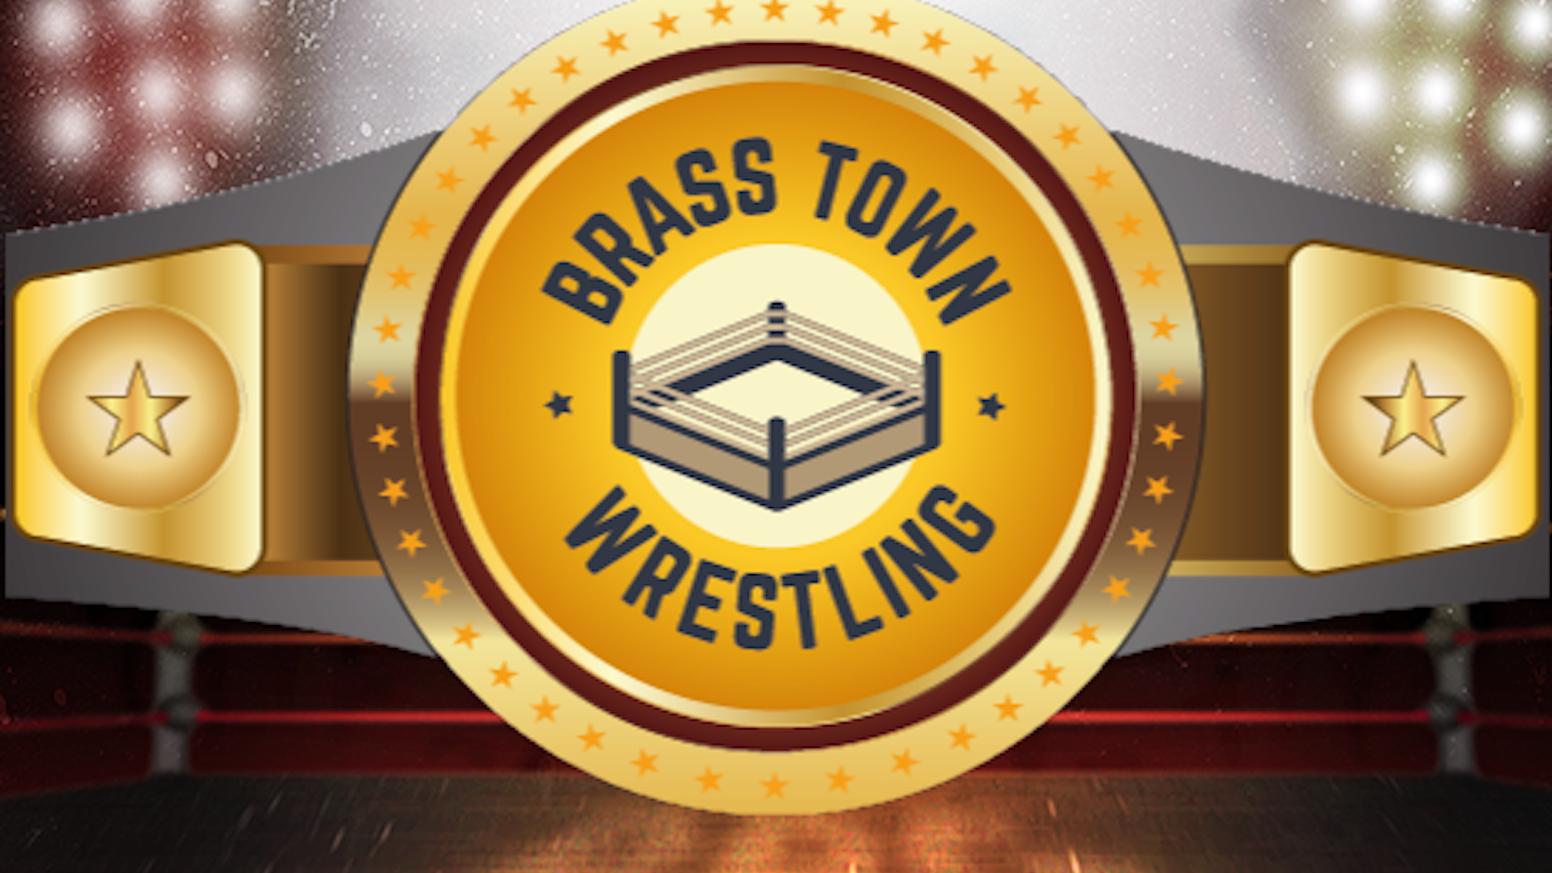 Brass Town Wrestling RPG by Mauro Amatosi — Kickstarter